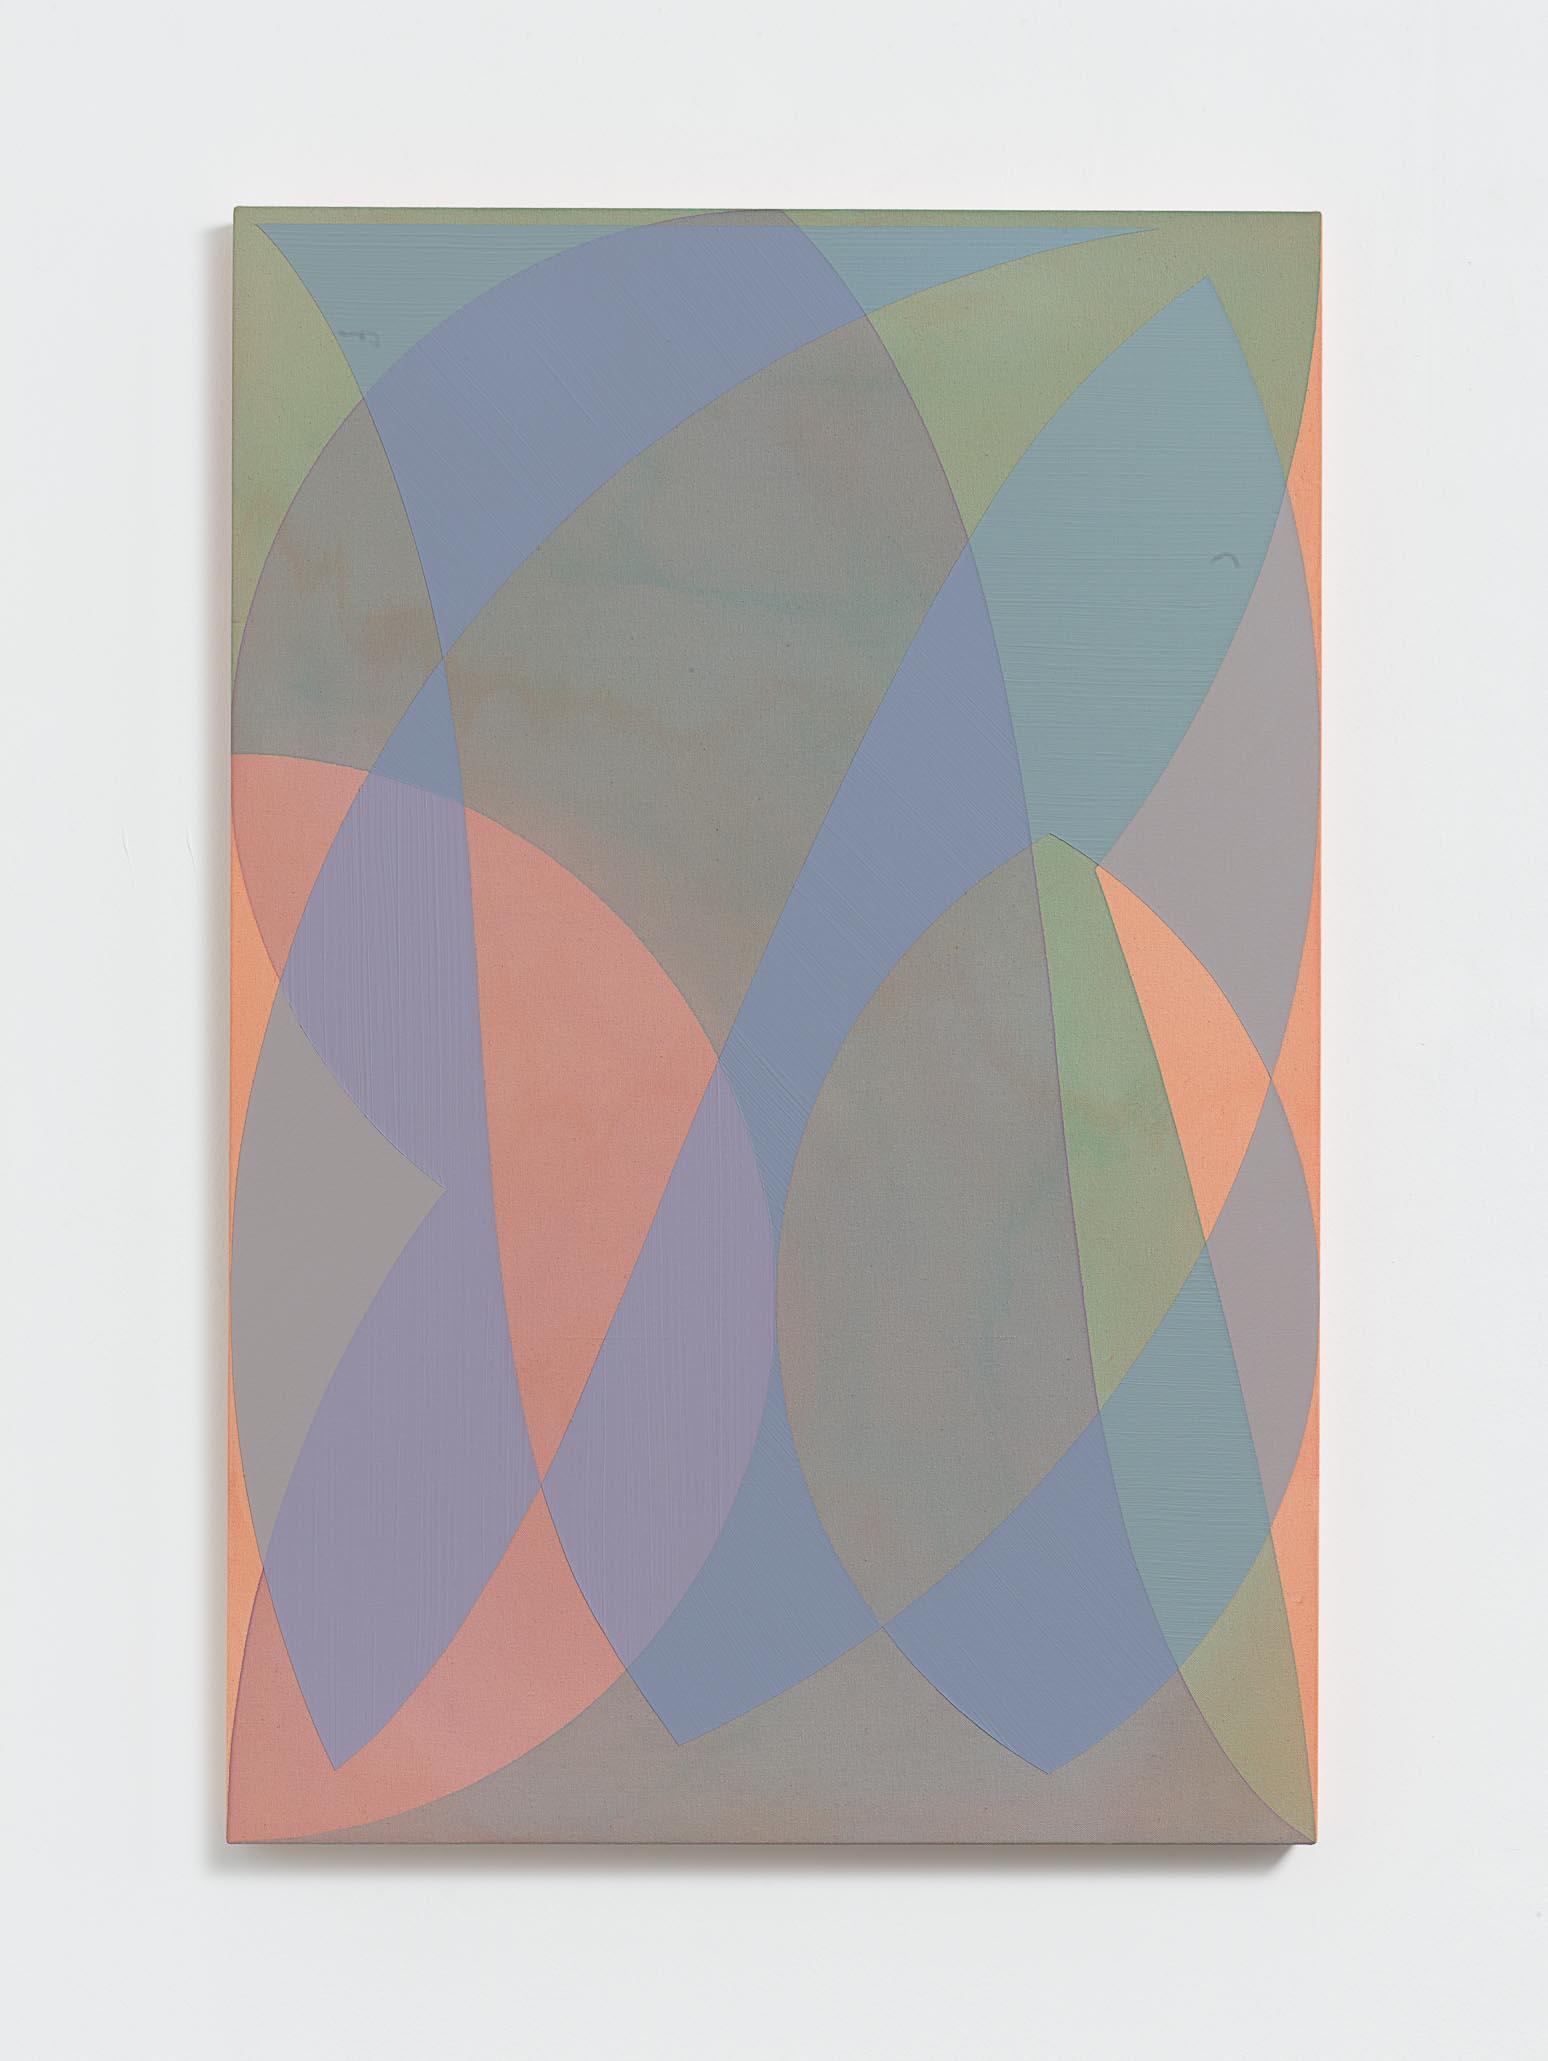 Halsey Hathaway, Untitled, 2016